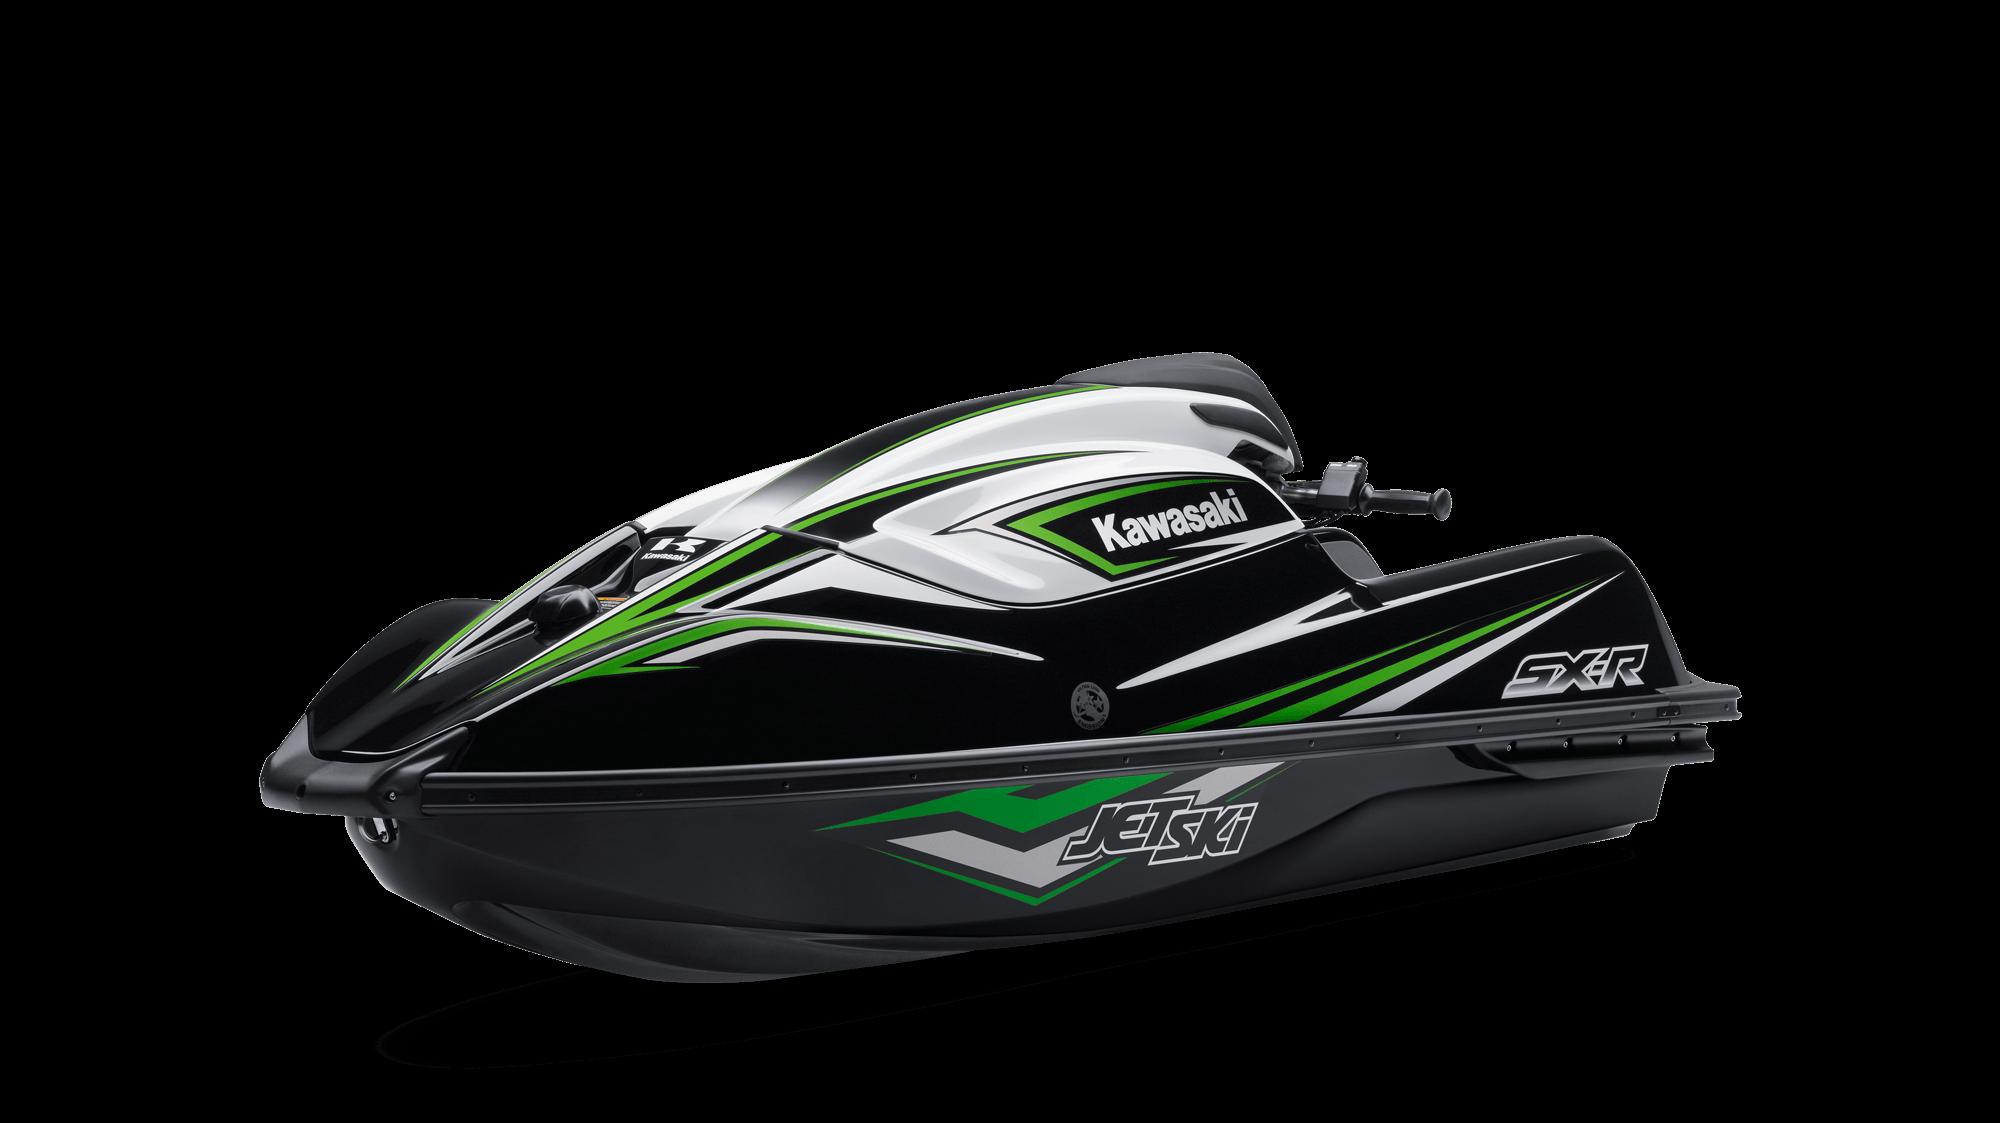 New Kawasaki Hp Jet Ski